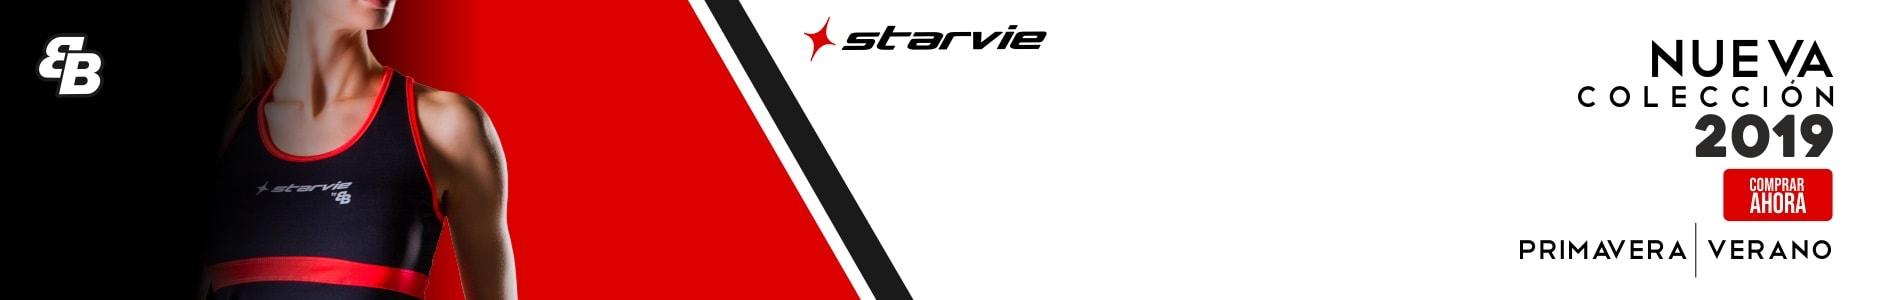 Coleccion ropa padel mujer verano StarVie by BB